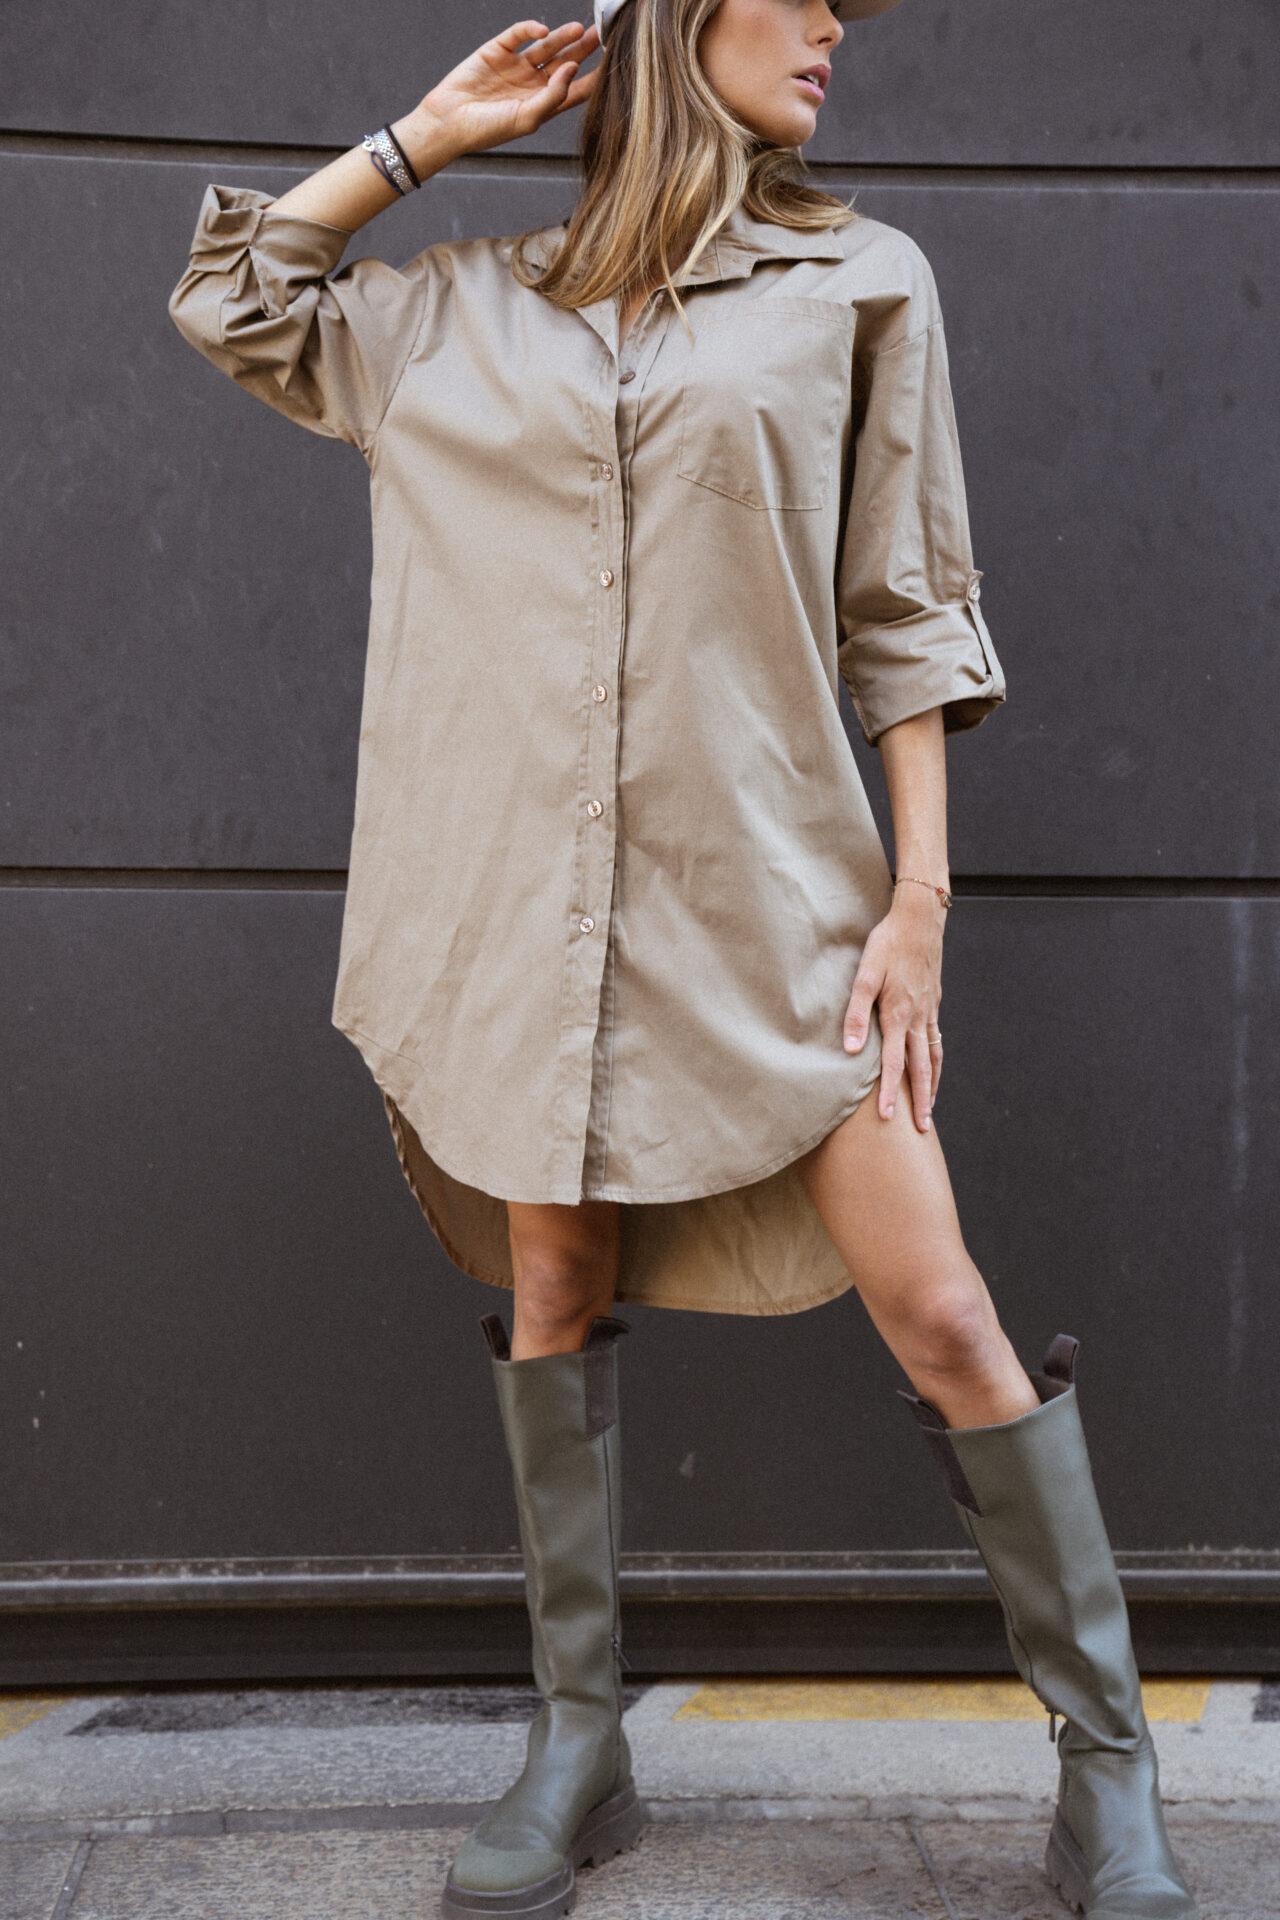 robe-chemise-beige-botte-de-pluie-casquette-femme-gisette-store (15)